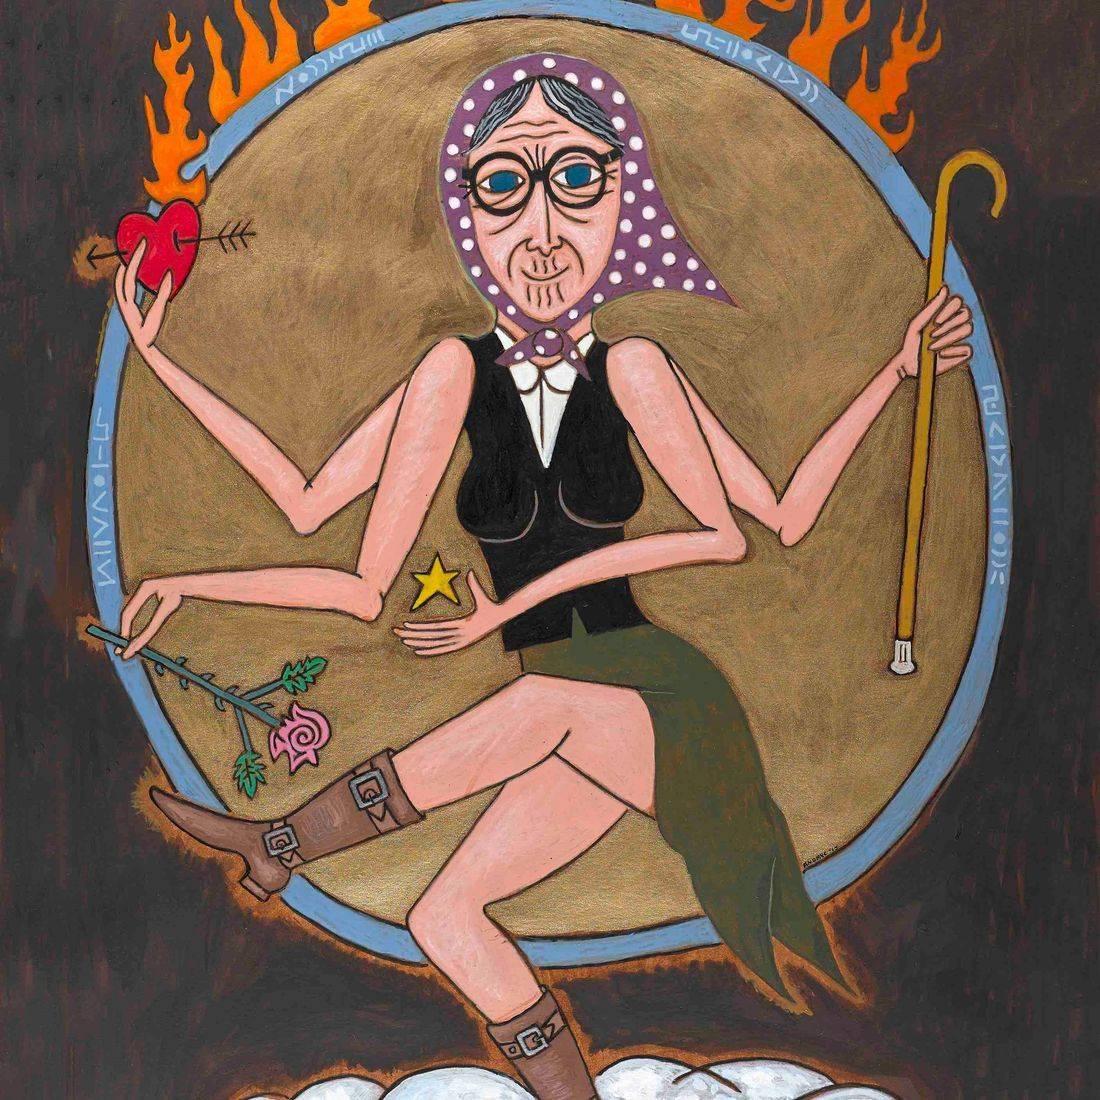 Vishnu, Hindu God, Hoop of Fire, Cloud, Fire, Babushka, Boots, Heart, Cane, Rose